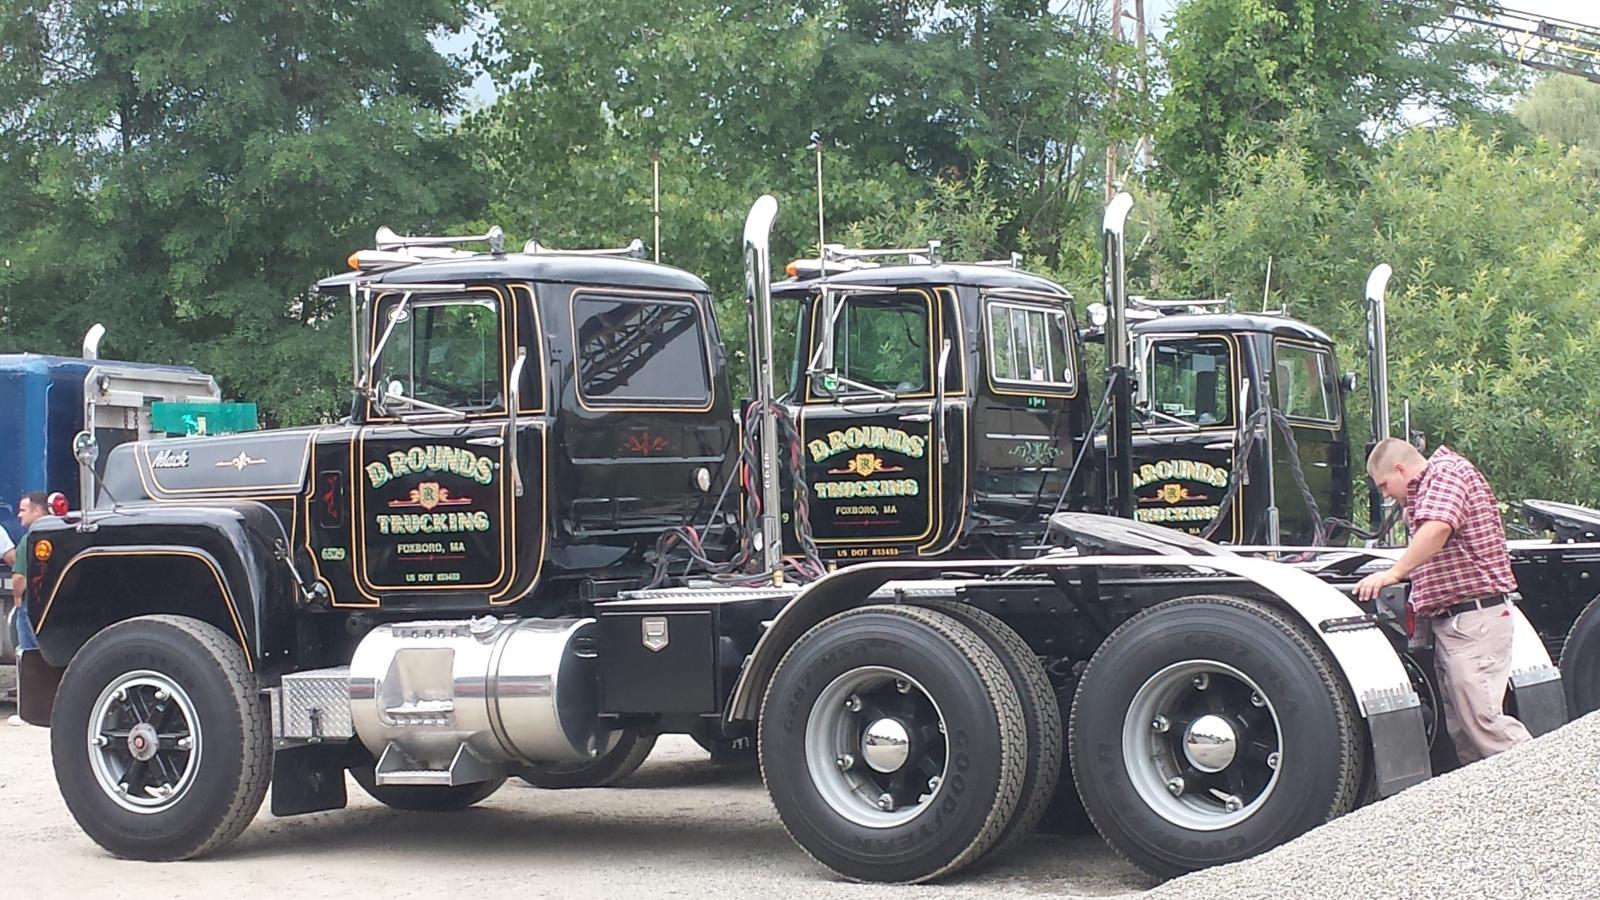 Worcester Sand & Gravel truck show - Truck Shows and Events - BigMackTrucks.com